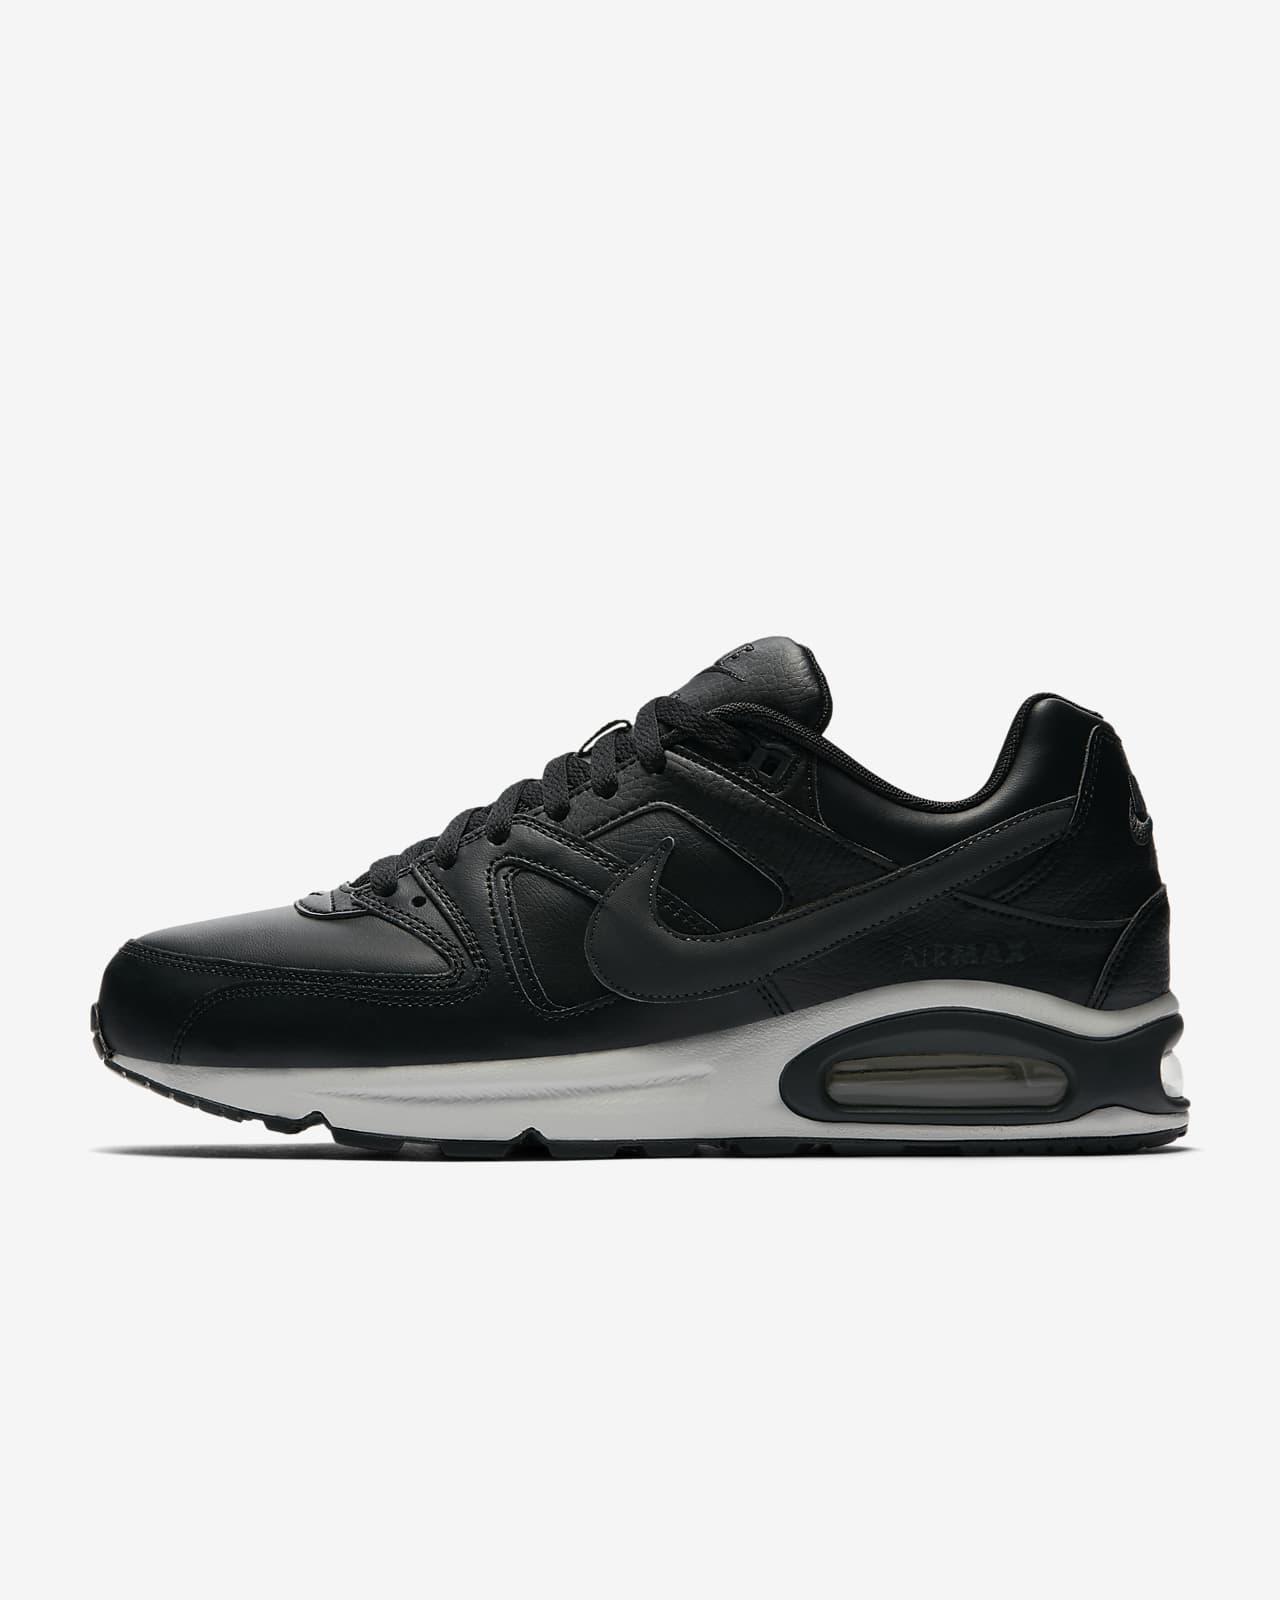 Nike Air Max Command Men's Shoe. Nike MA